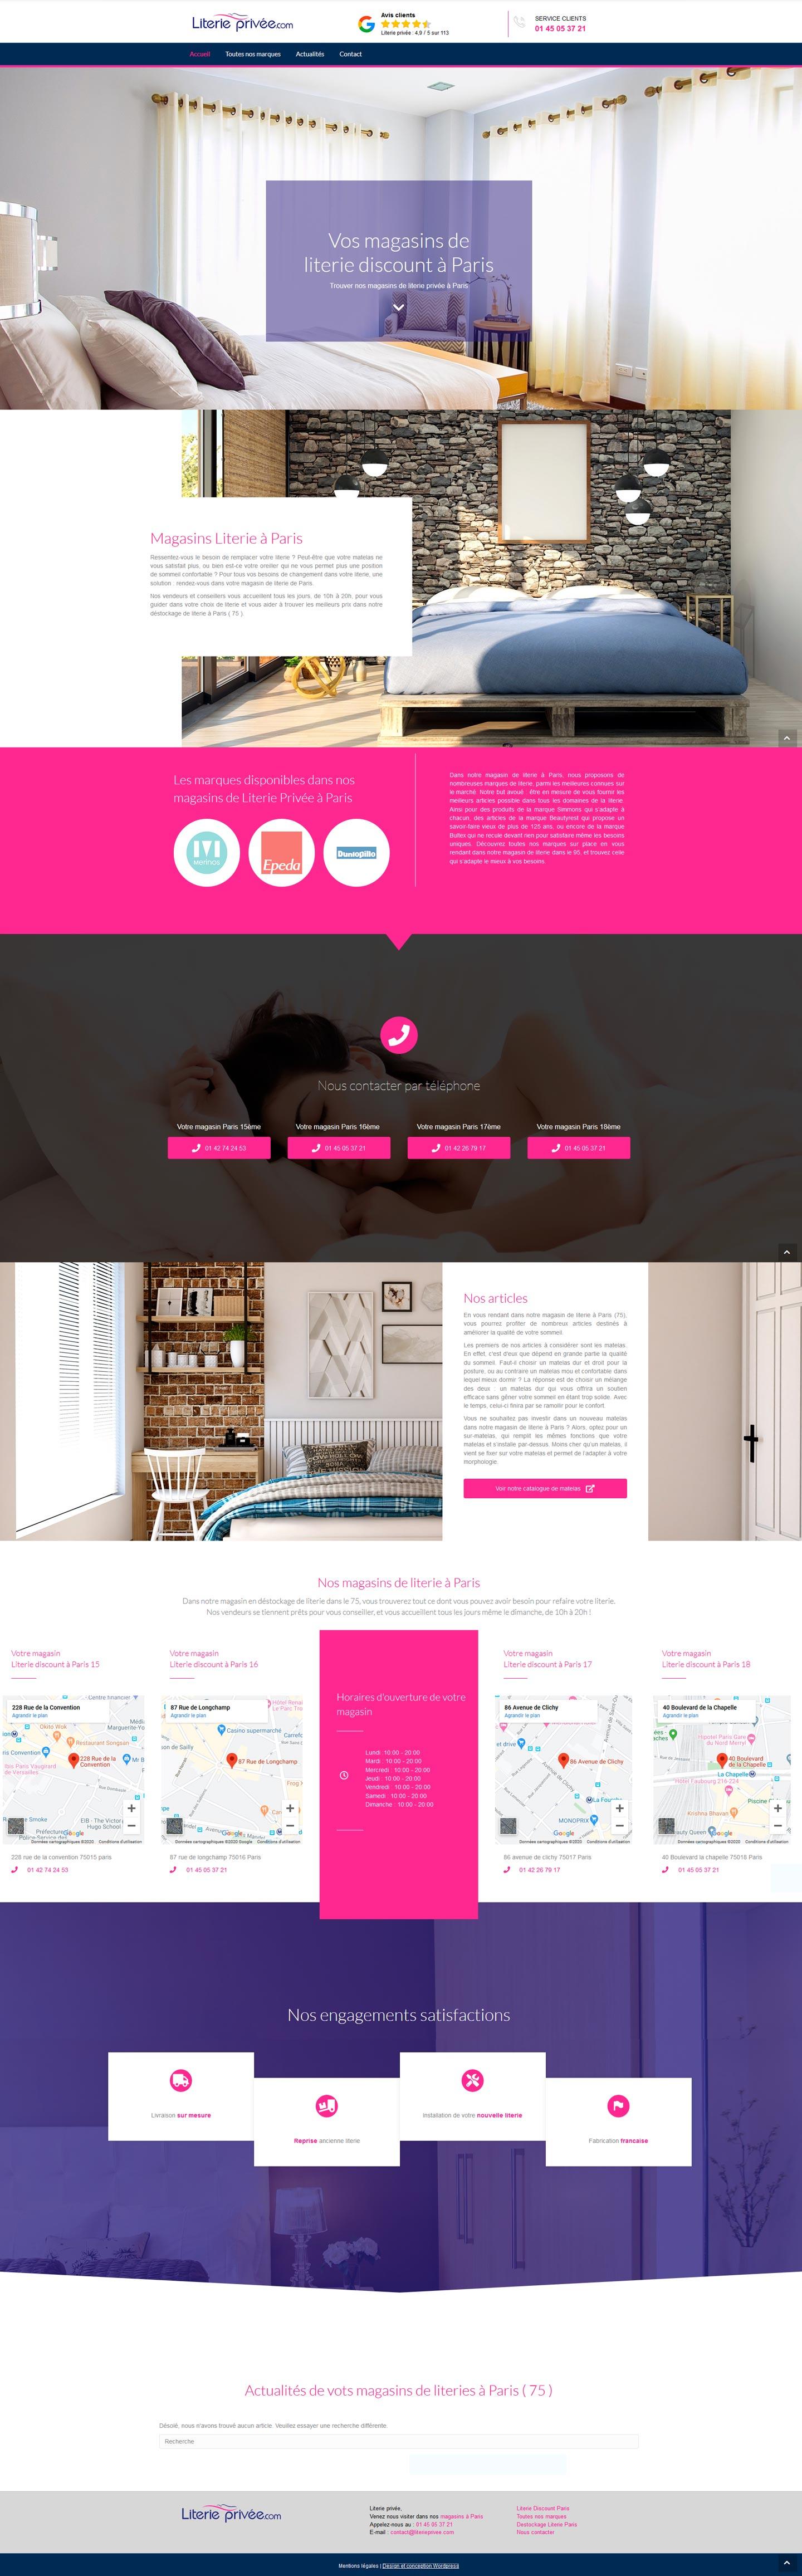 Literie Paris - Mission freelance design Wordress